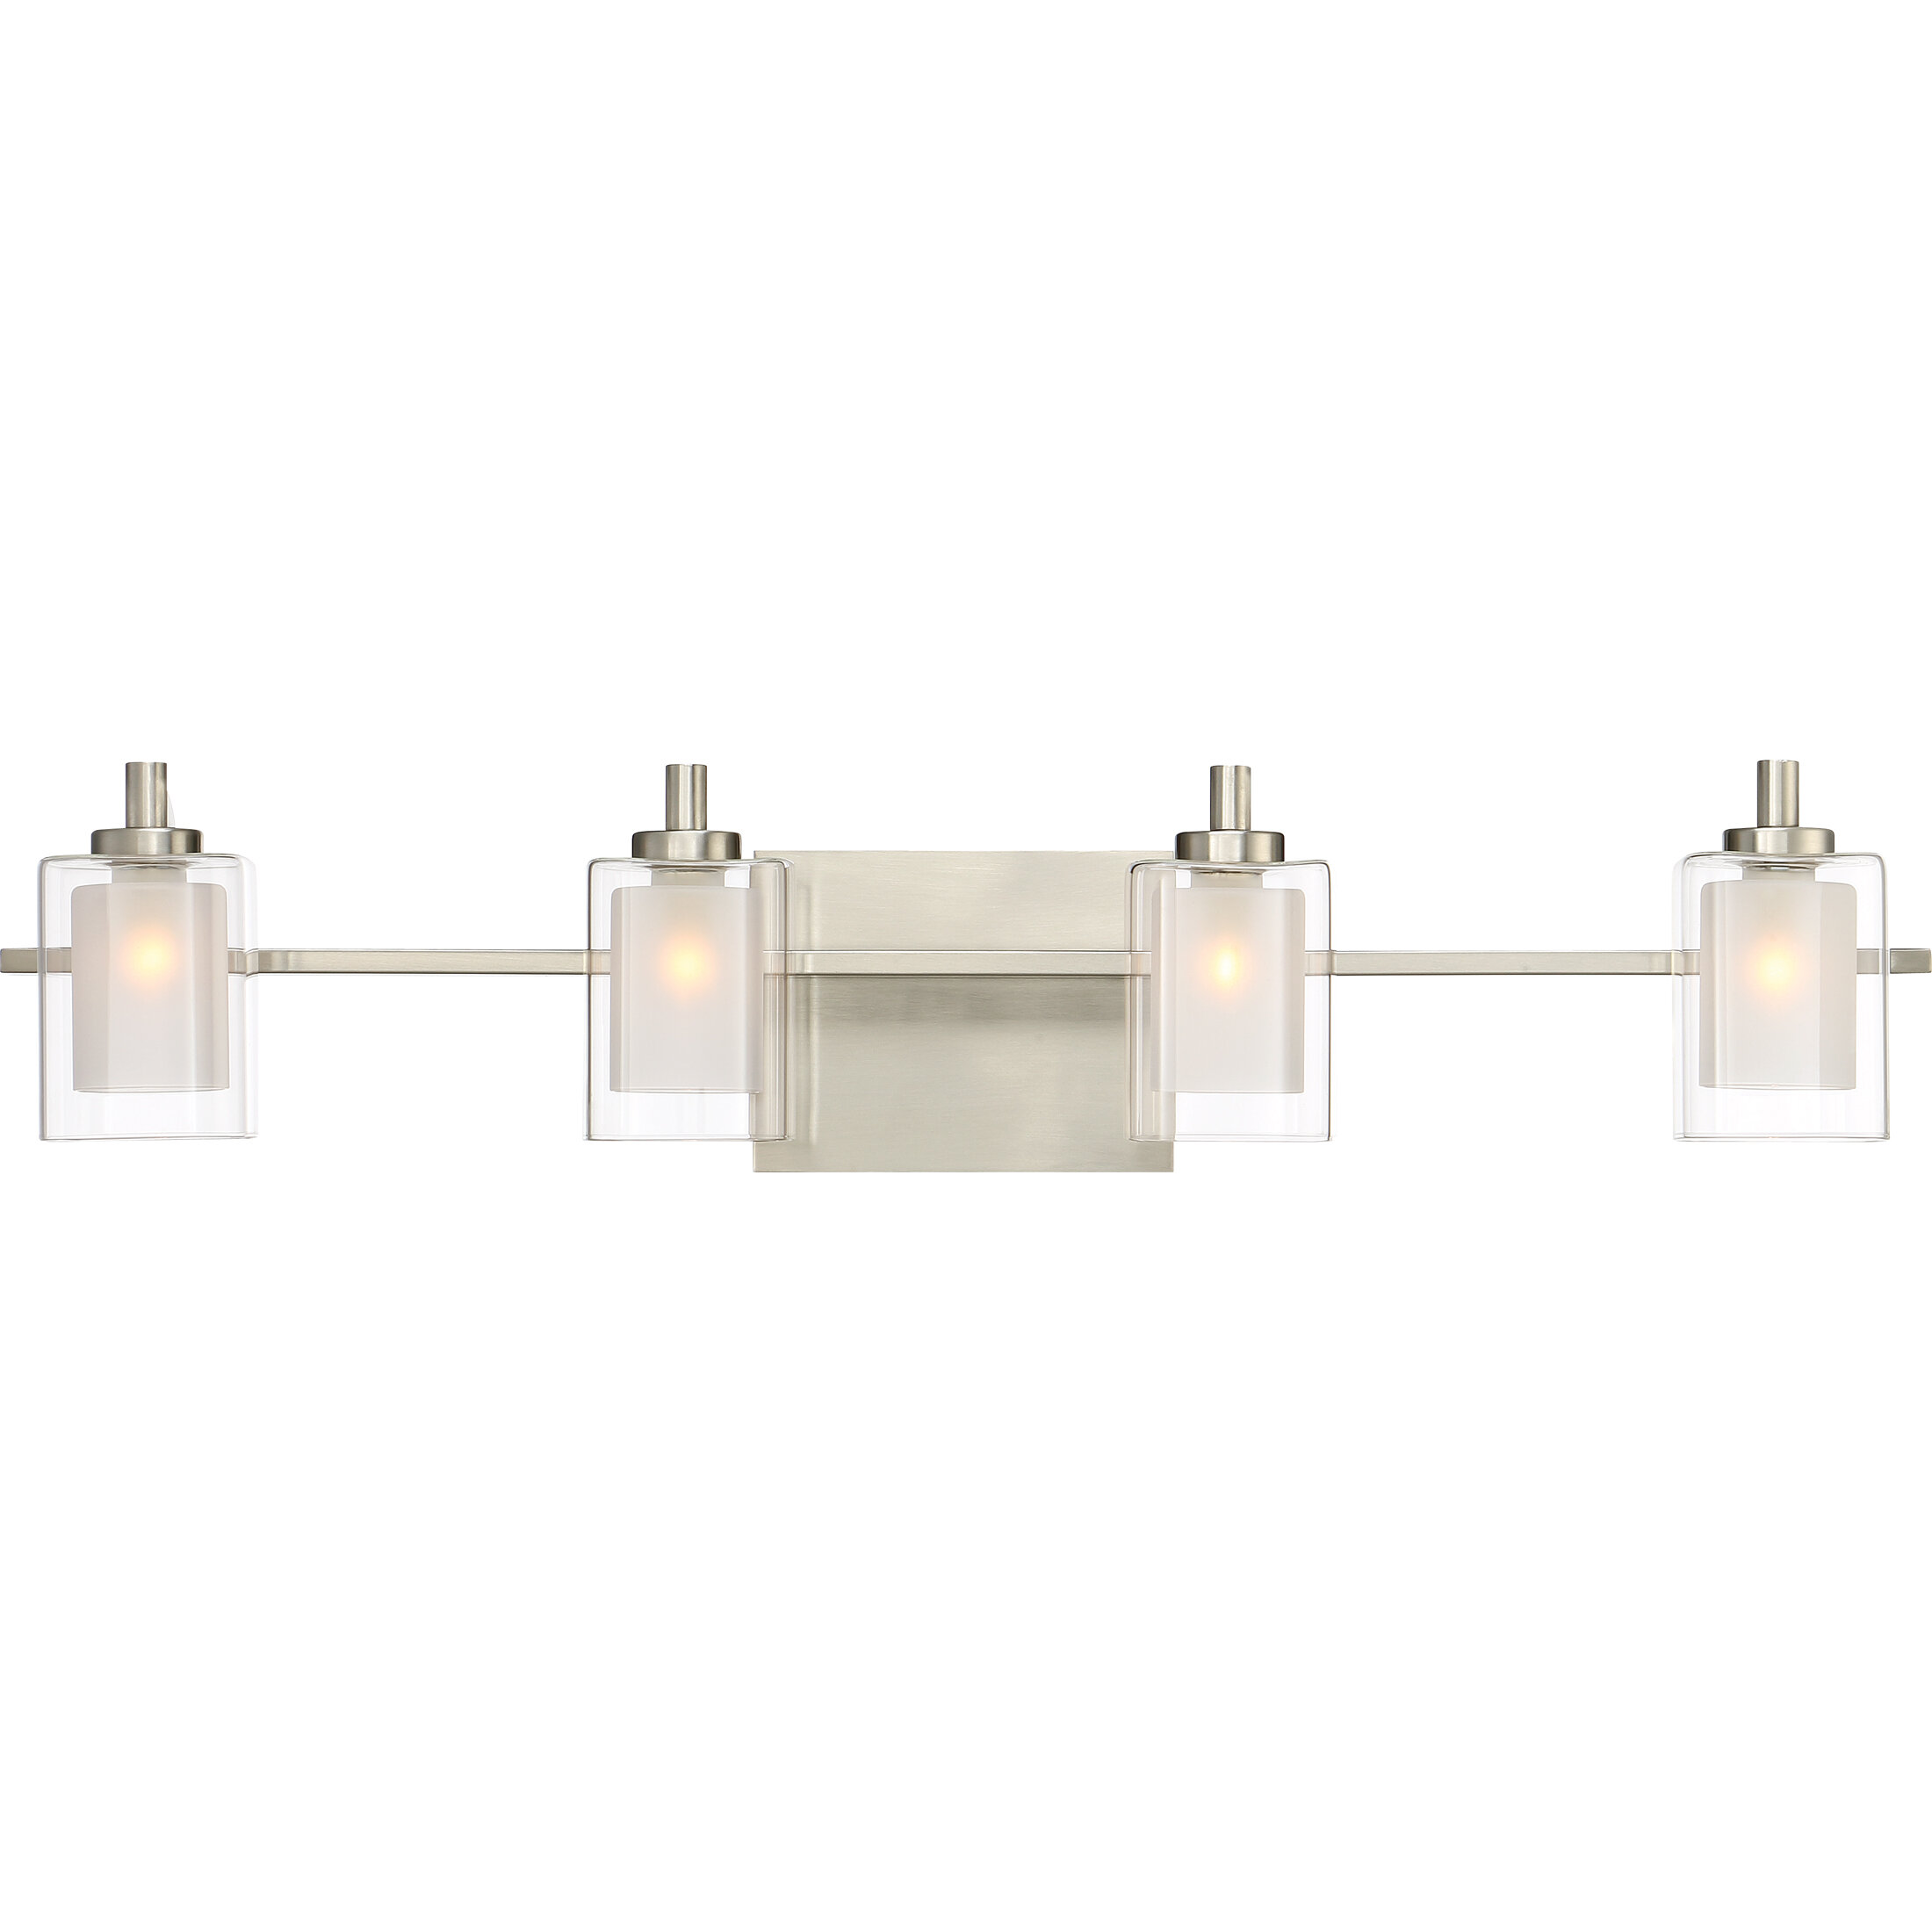 Contemporary vanity lighting Innovative Allmodern Aldrich 4light Vanity Light Reviews Allmodern